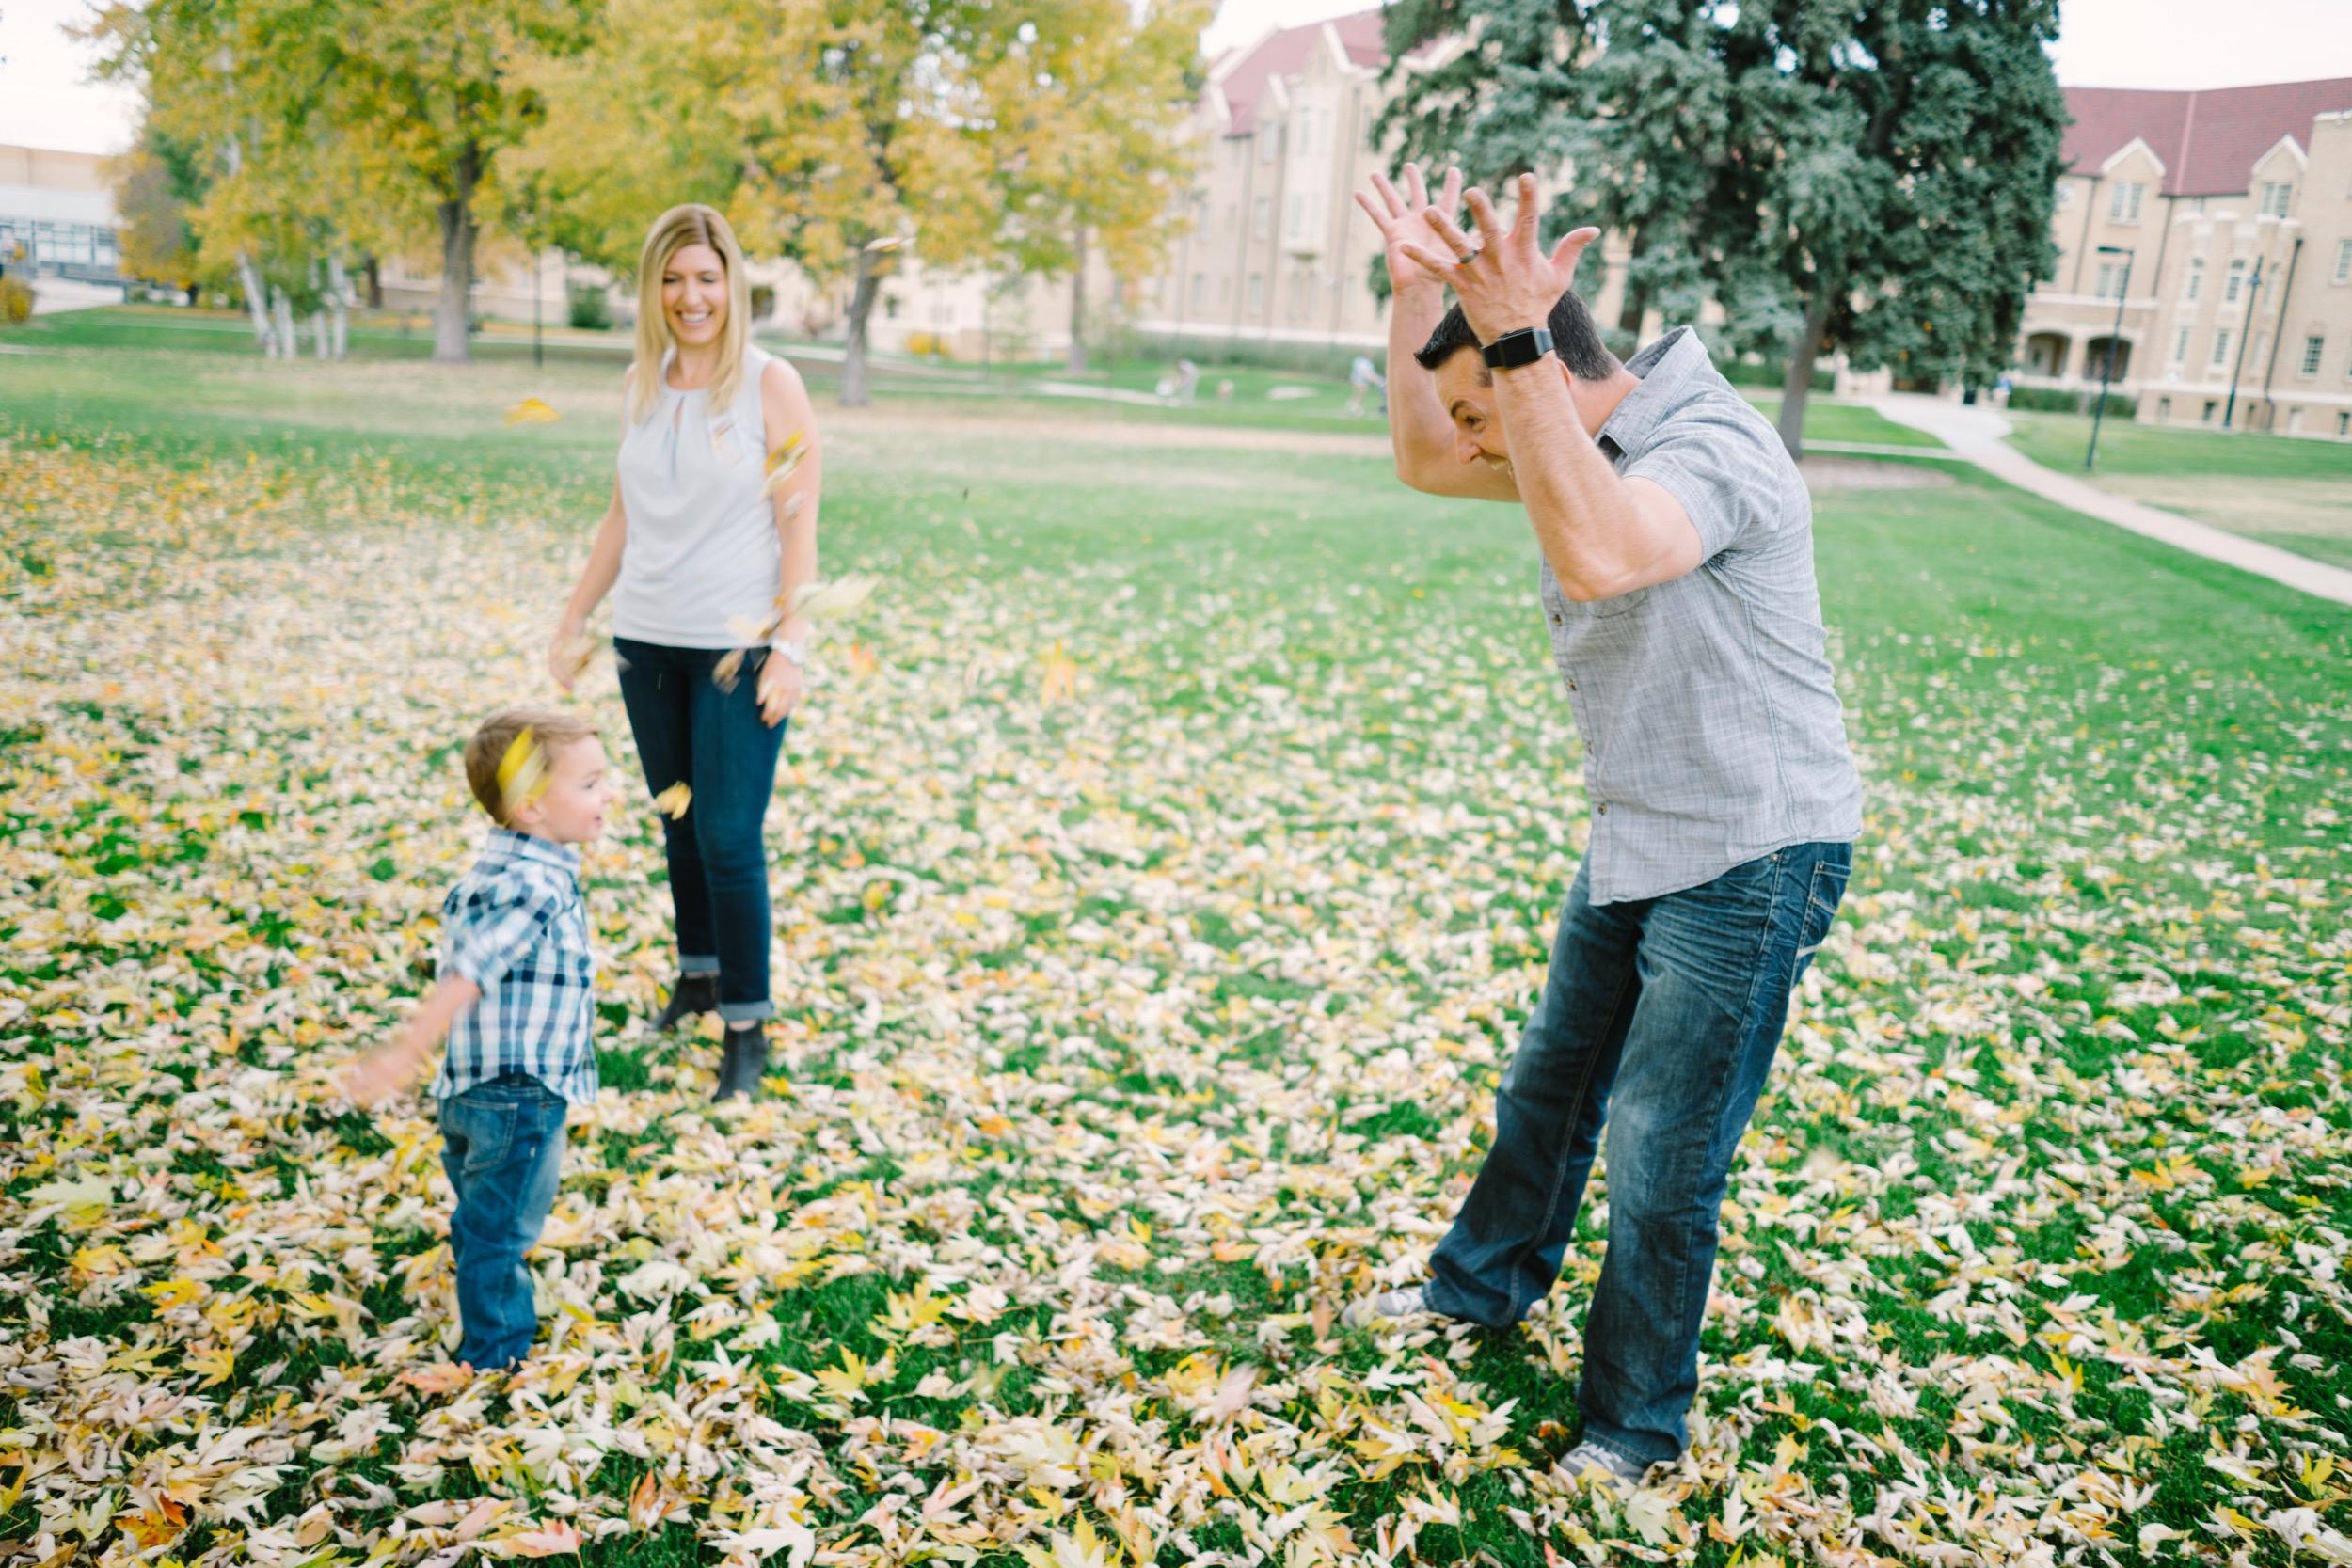 Denver Family Photography Dr. Bates - 12.jpg